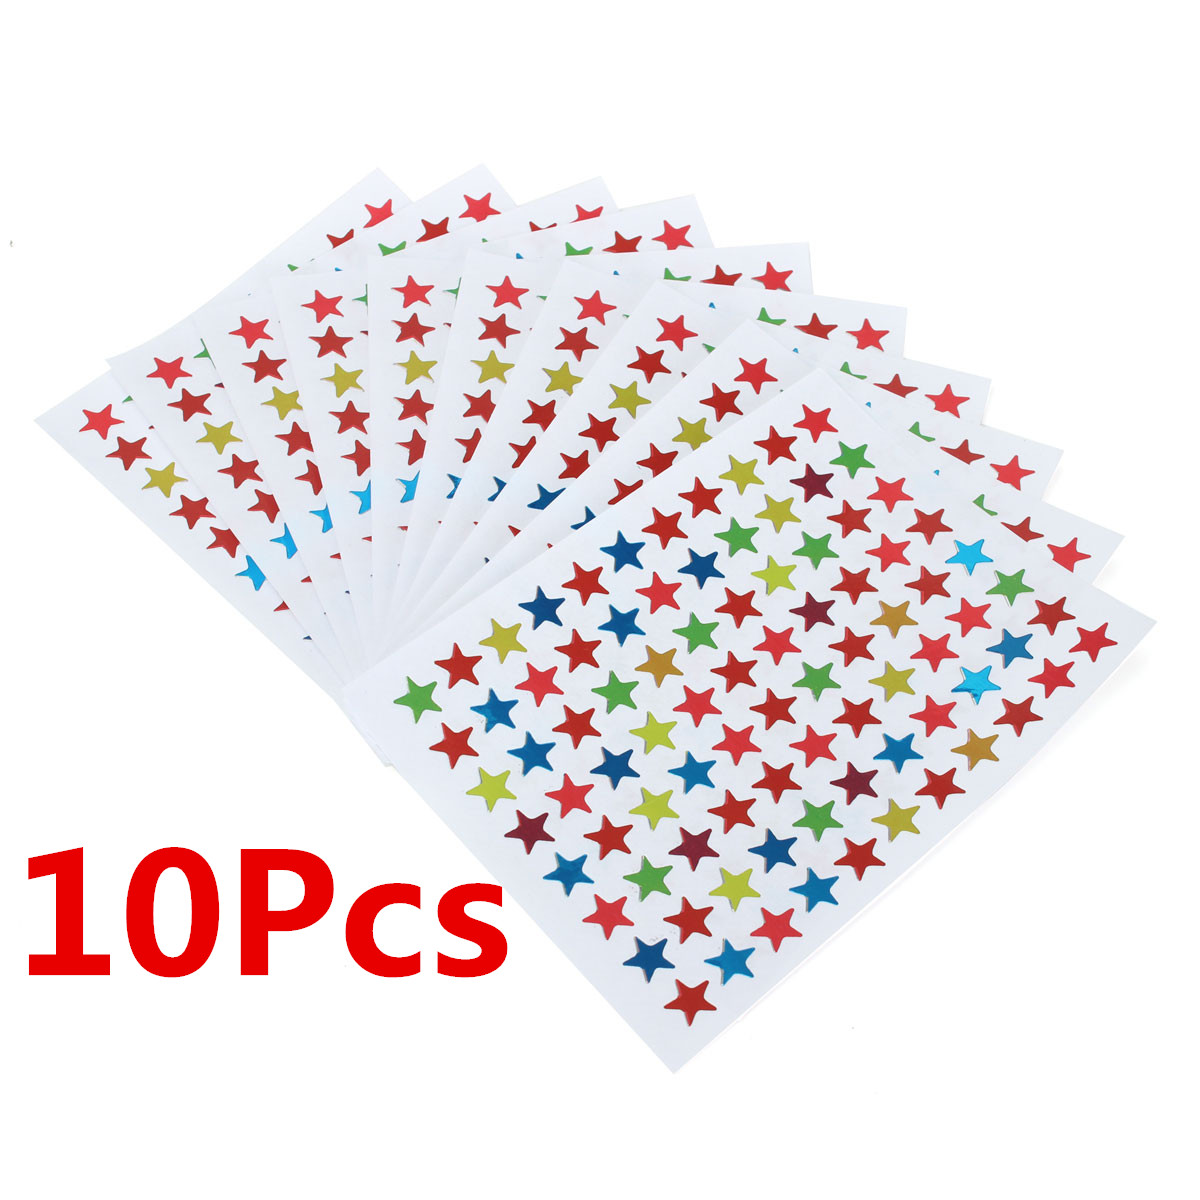 10pcs Lovely Star Stationery Sticker Teacher Label Reward Gift For Children Student Learning Book Sticker Decor School Supplies